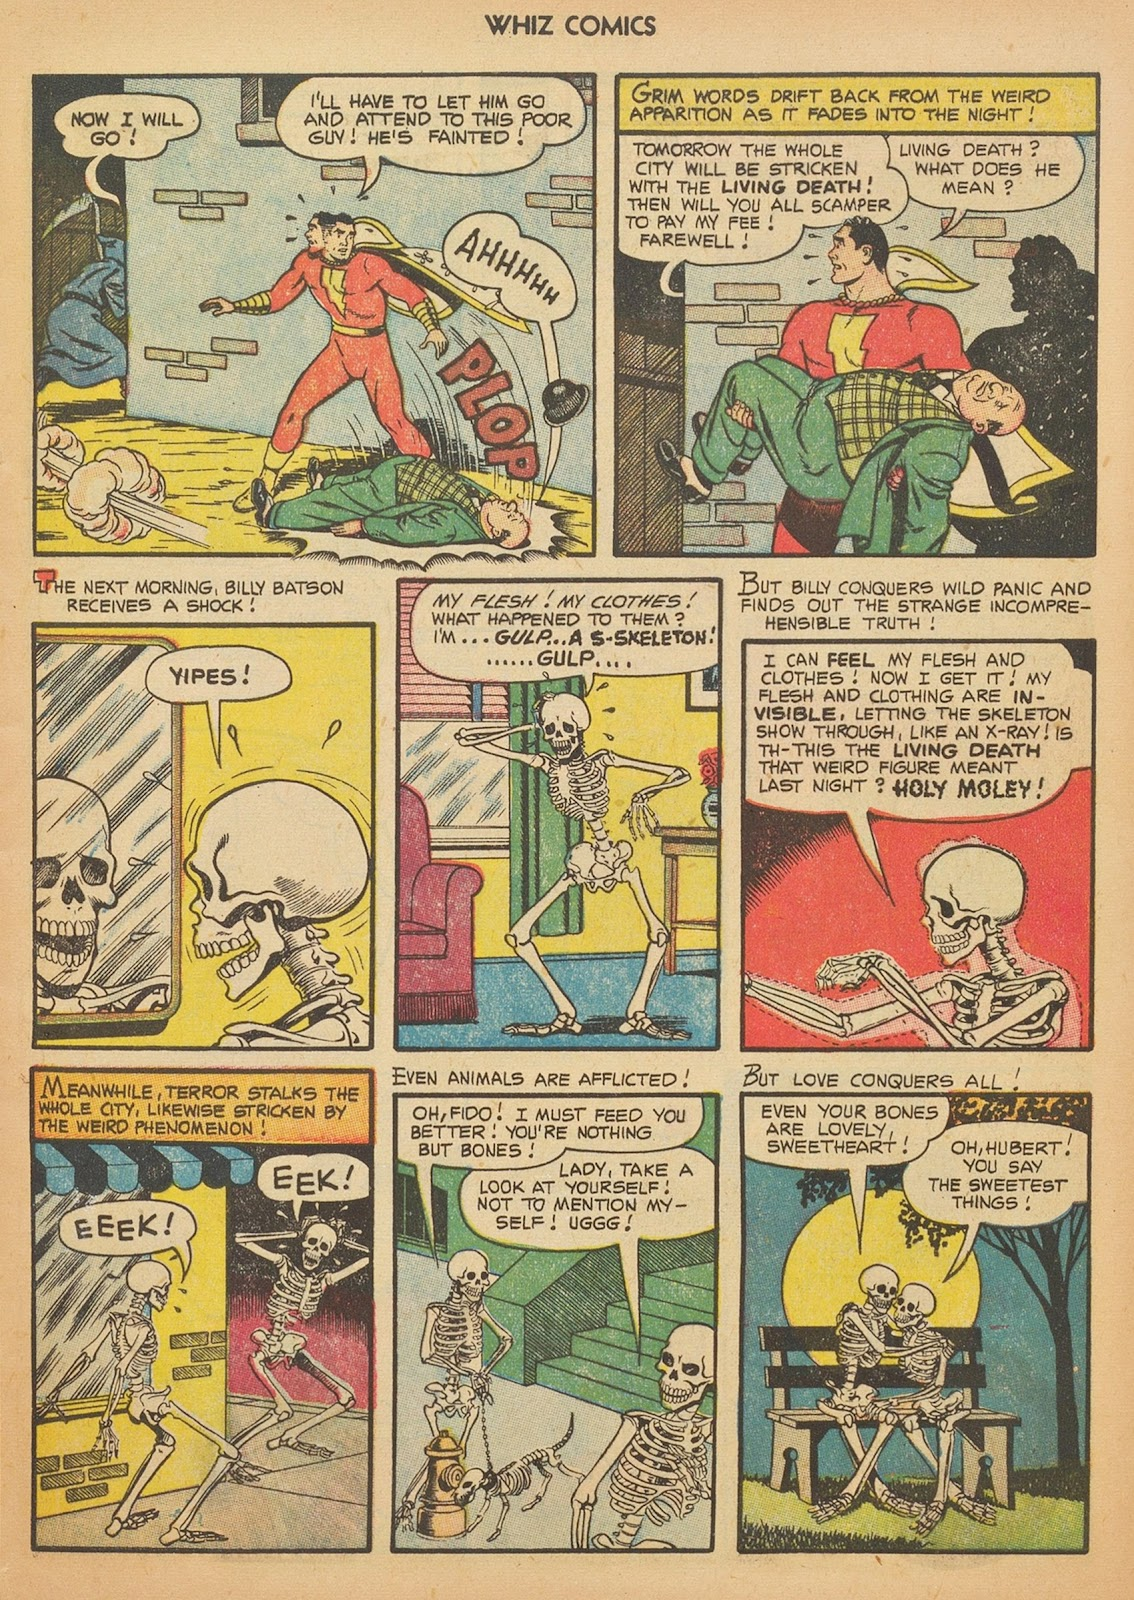 Read online WHIZ Comics comic -  Issue #153 - 5